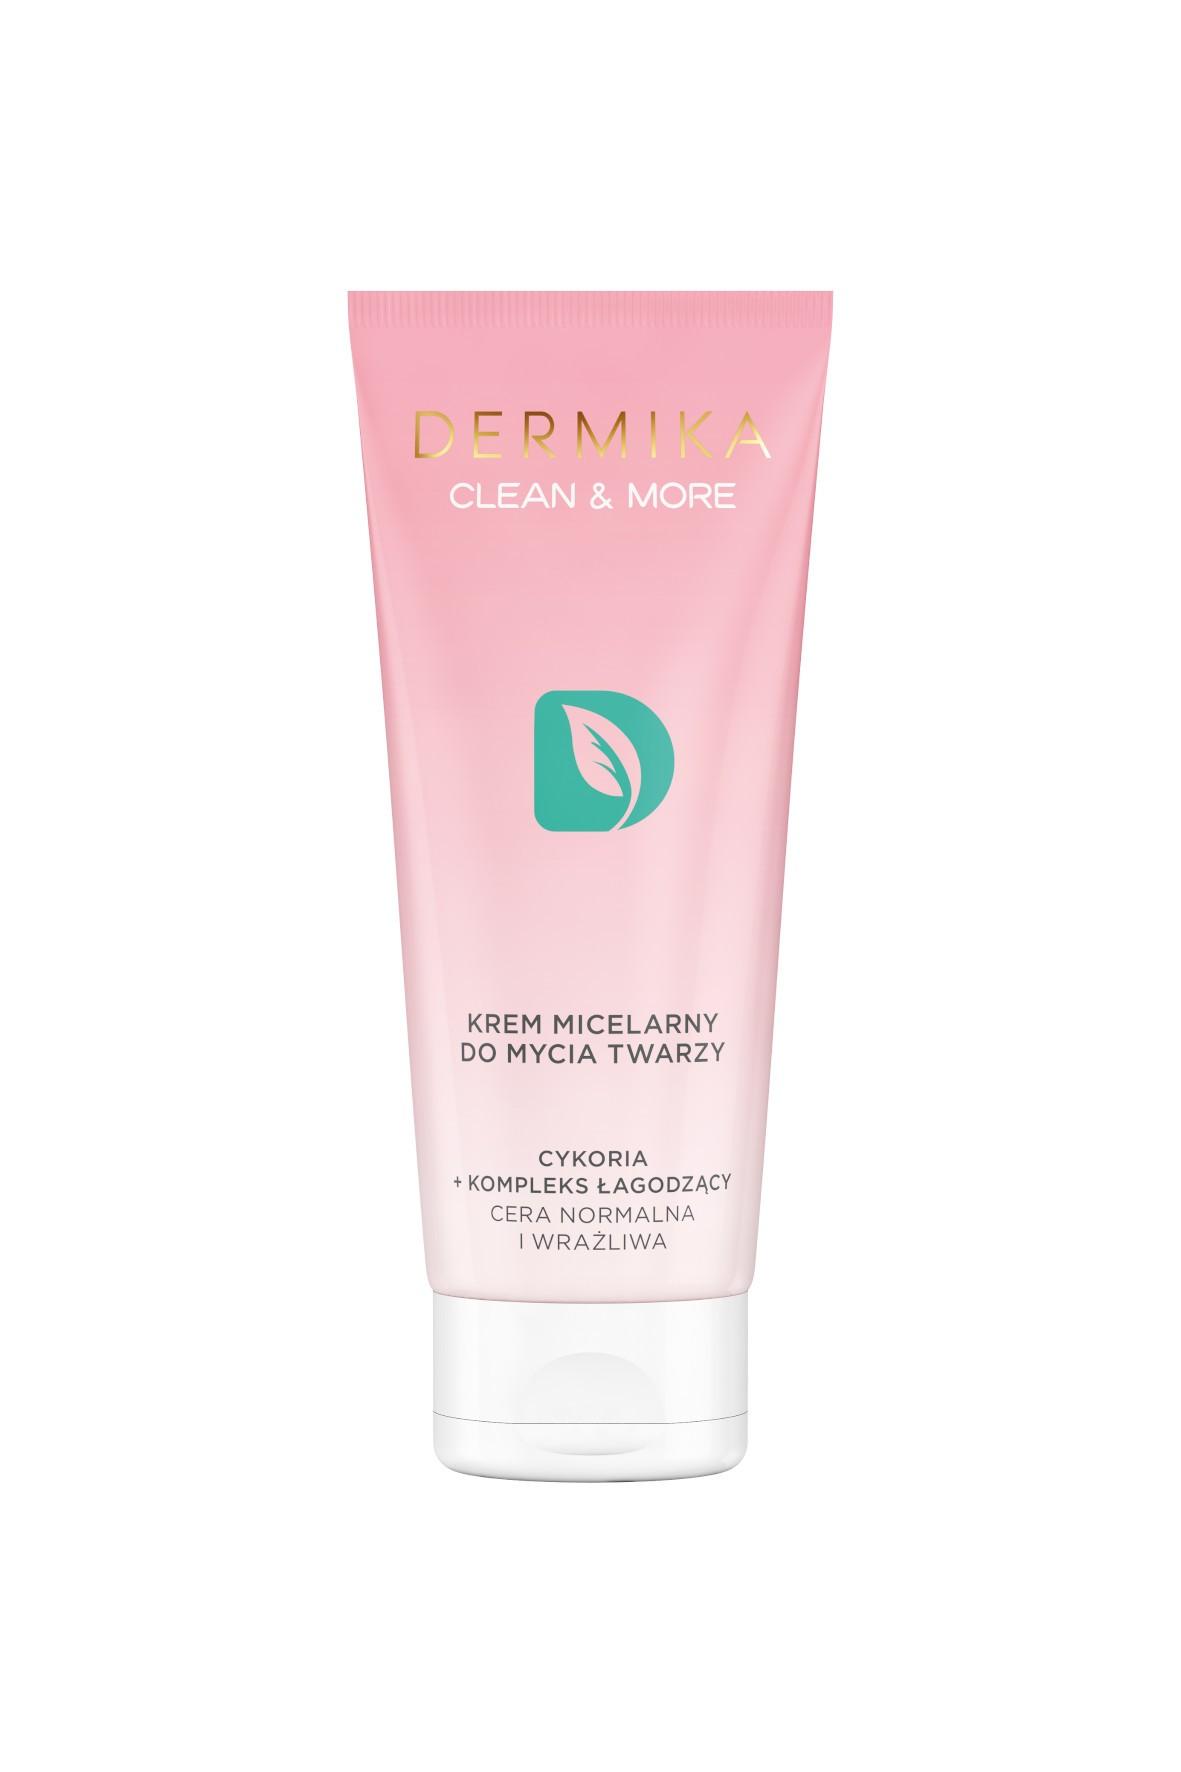 DERMIKA CLEAN&MORE krem micelarny do mycia twarzy  - 150ml